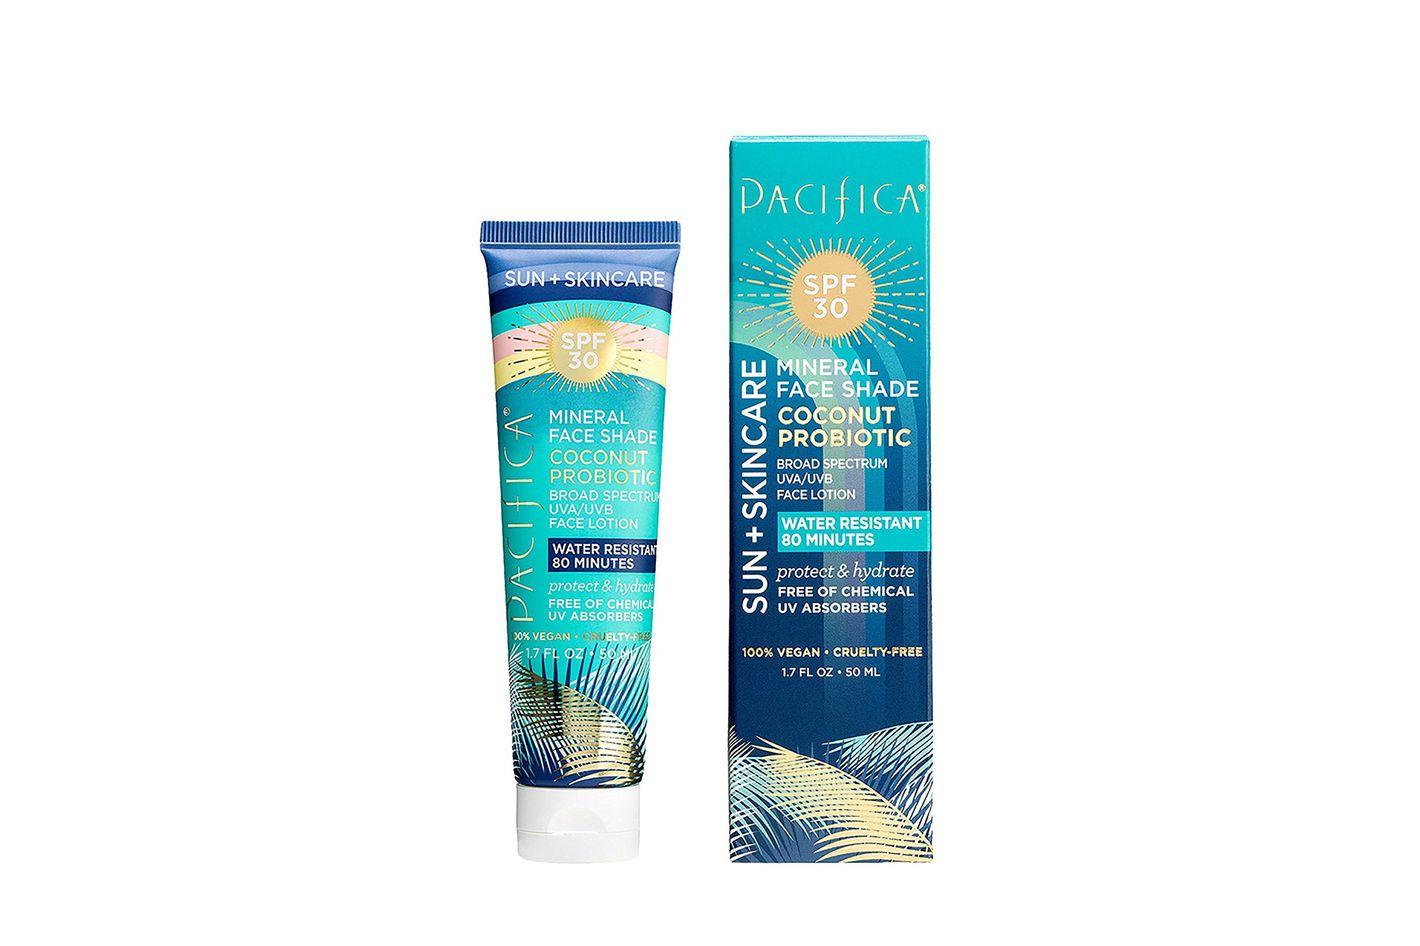 Pacifica Sun + Skincare Mineral Face Shade Coconut Probiotic SPF 30